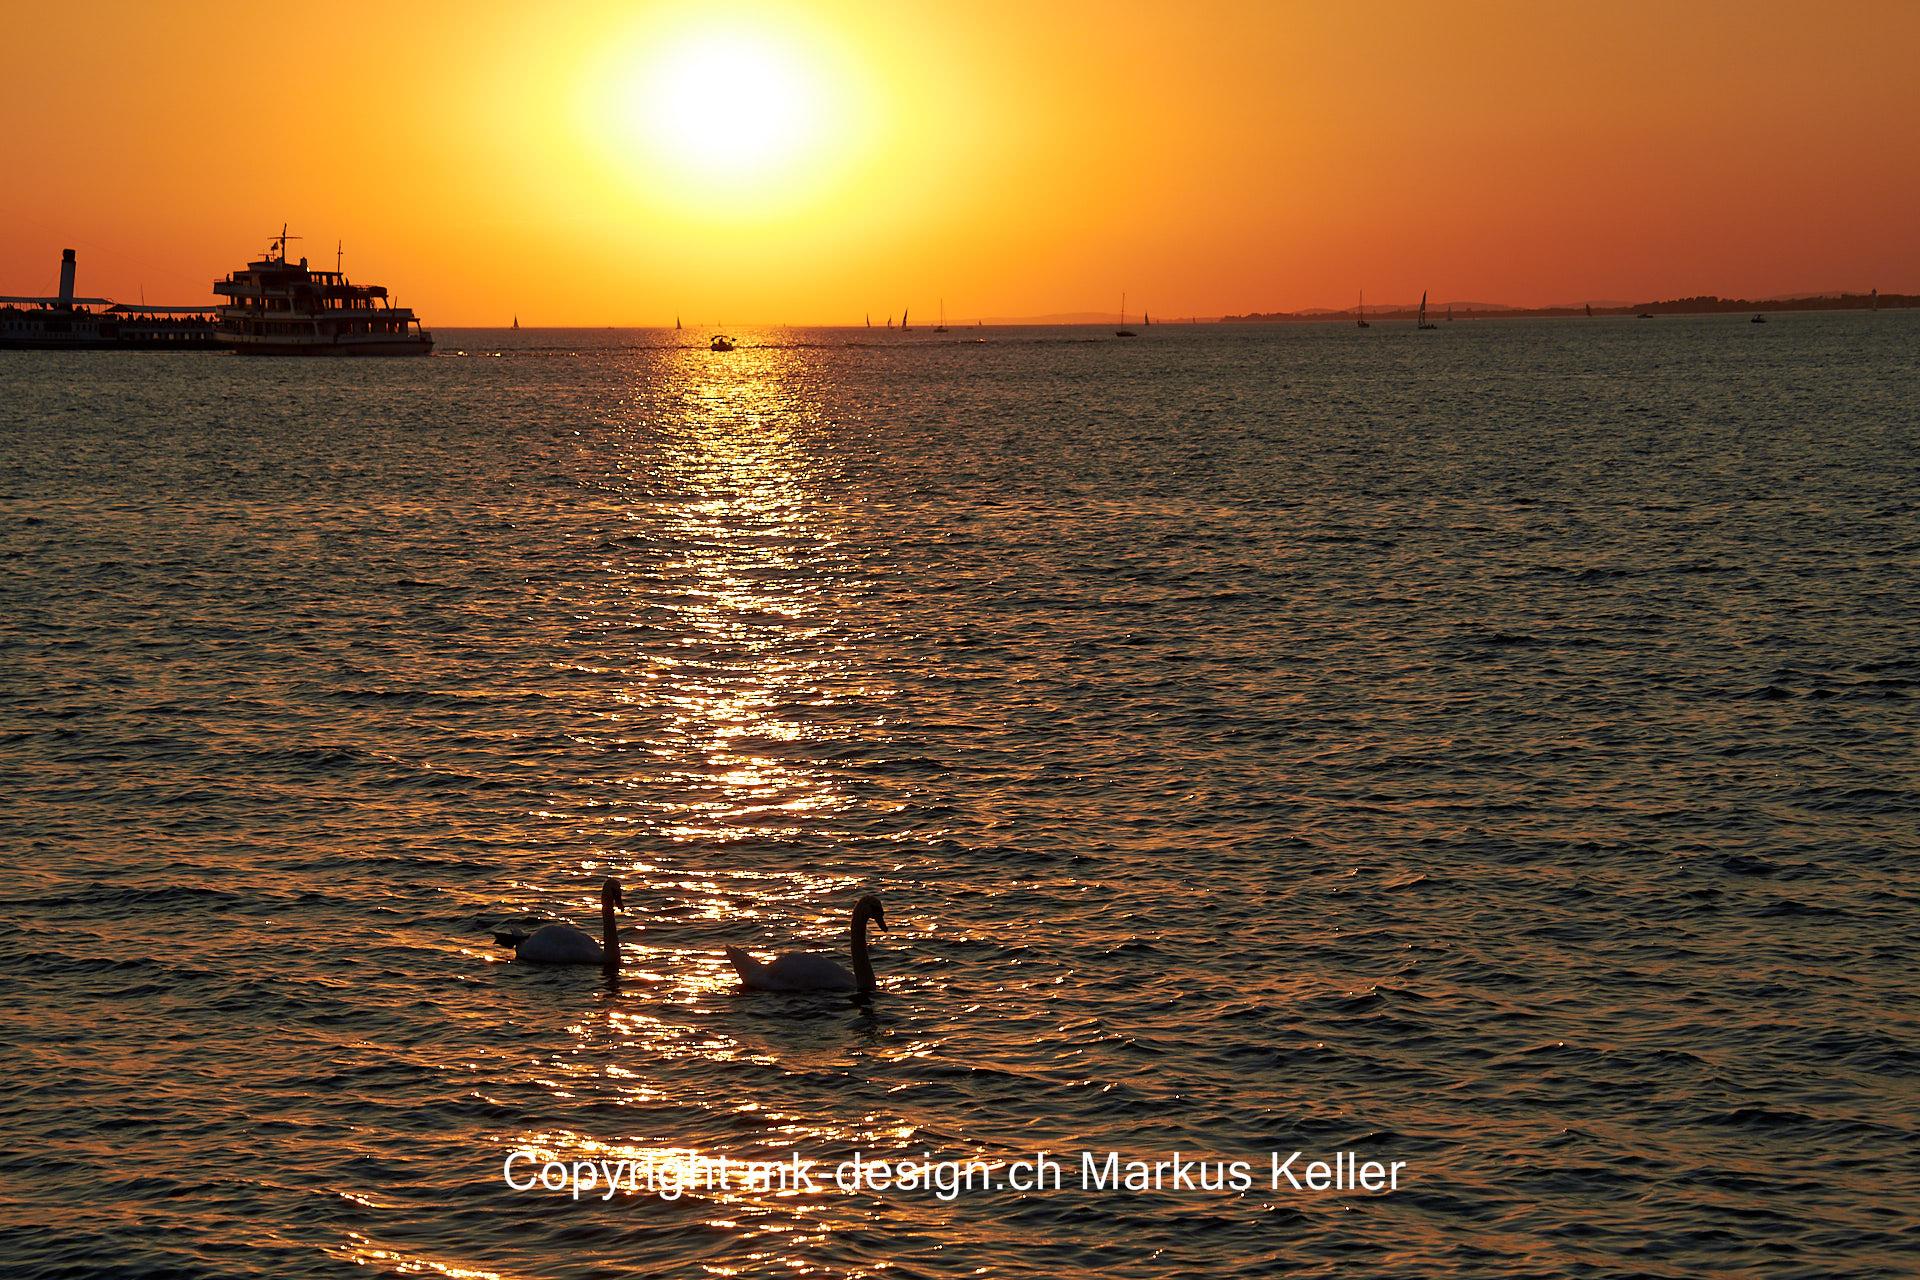 Sonne   Sonnenuntergang   See   Bodensee   Tier   Vogel   Schwan